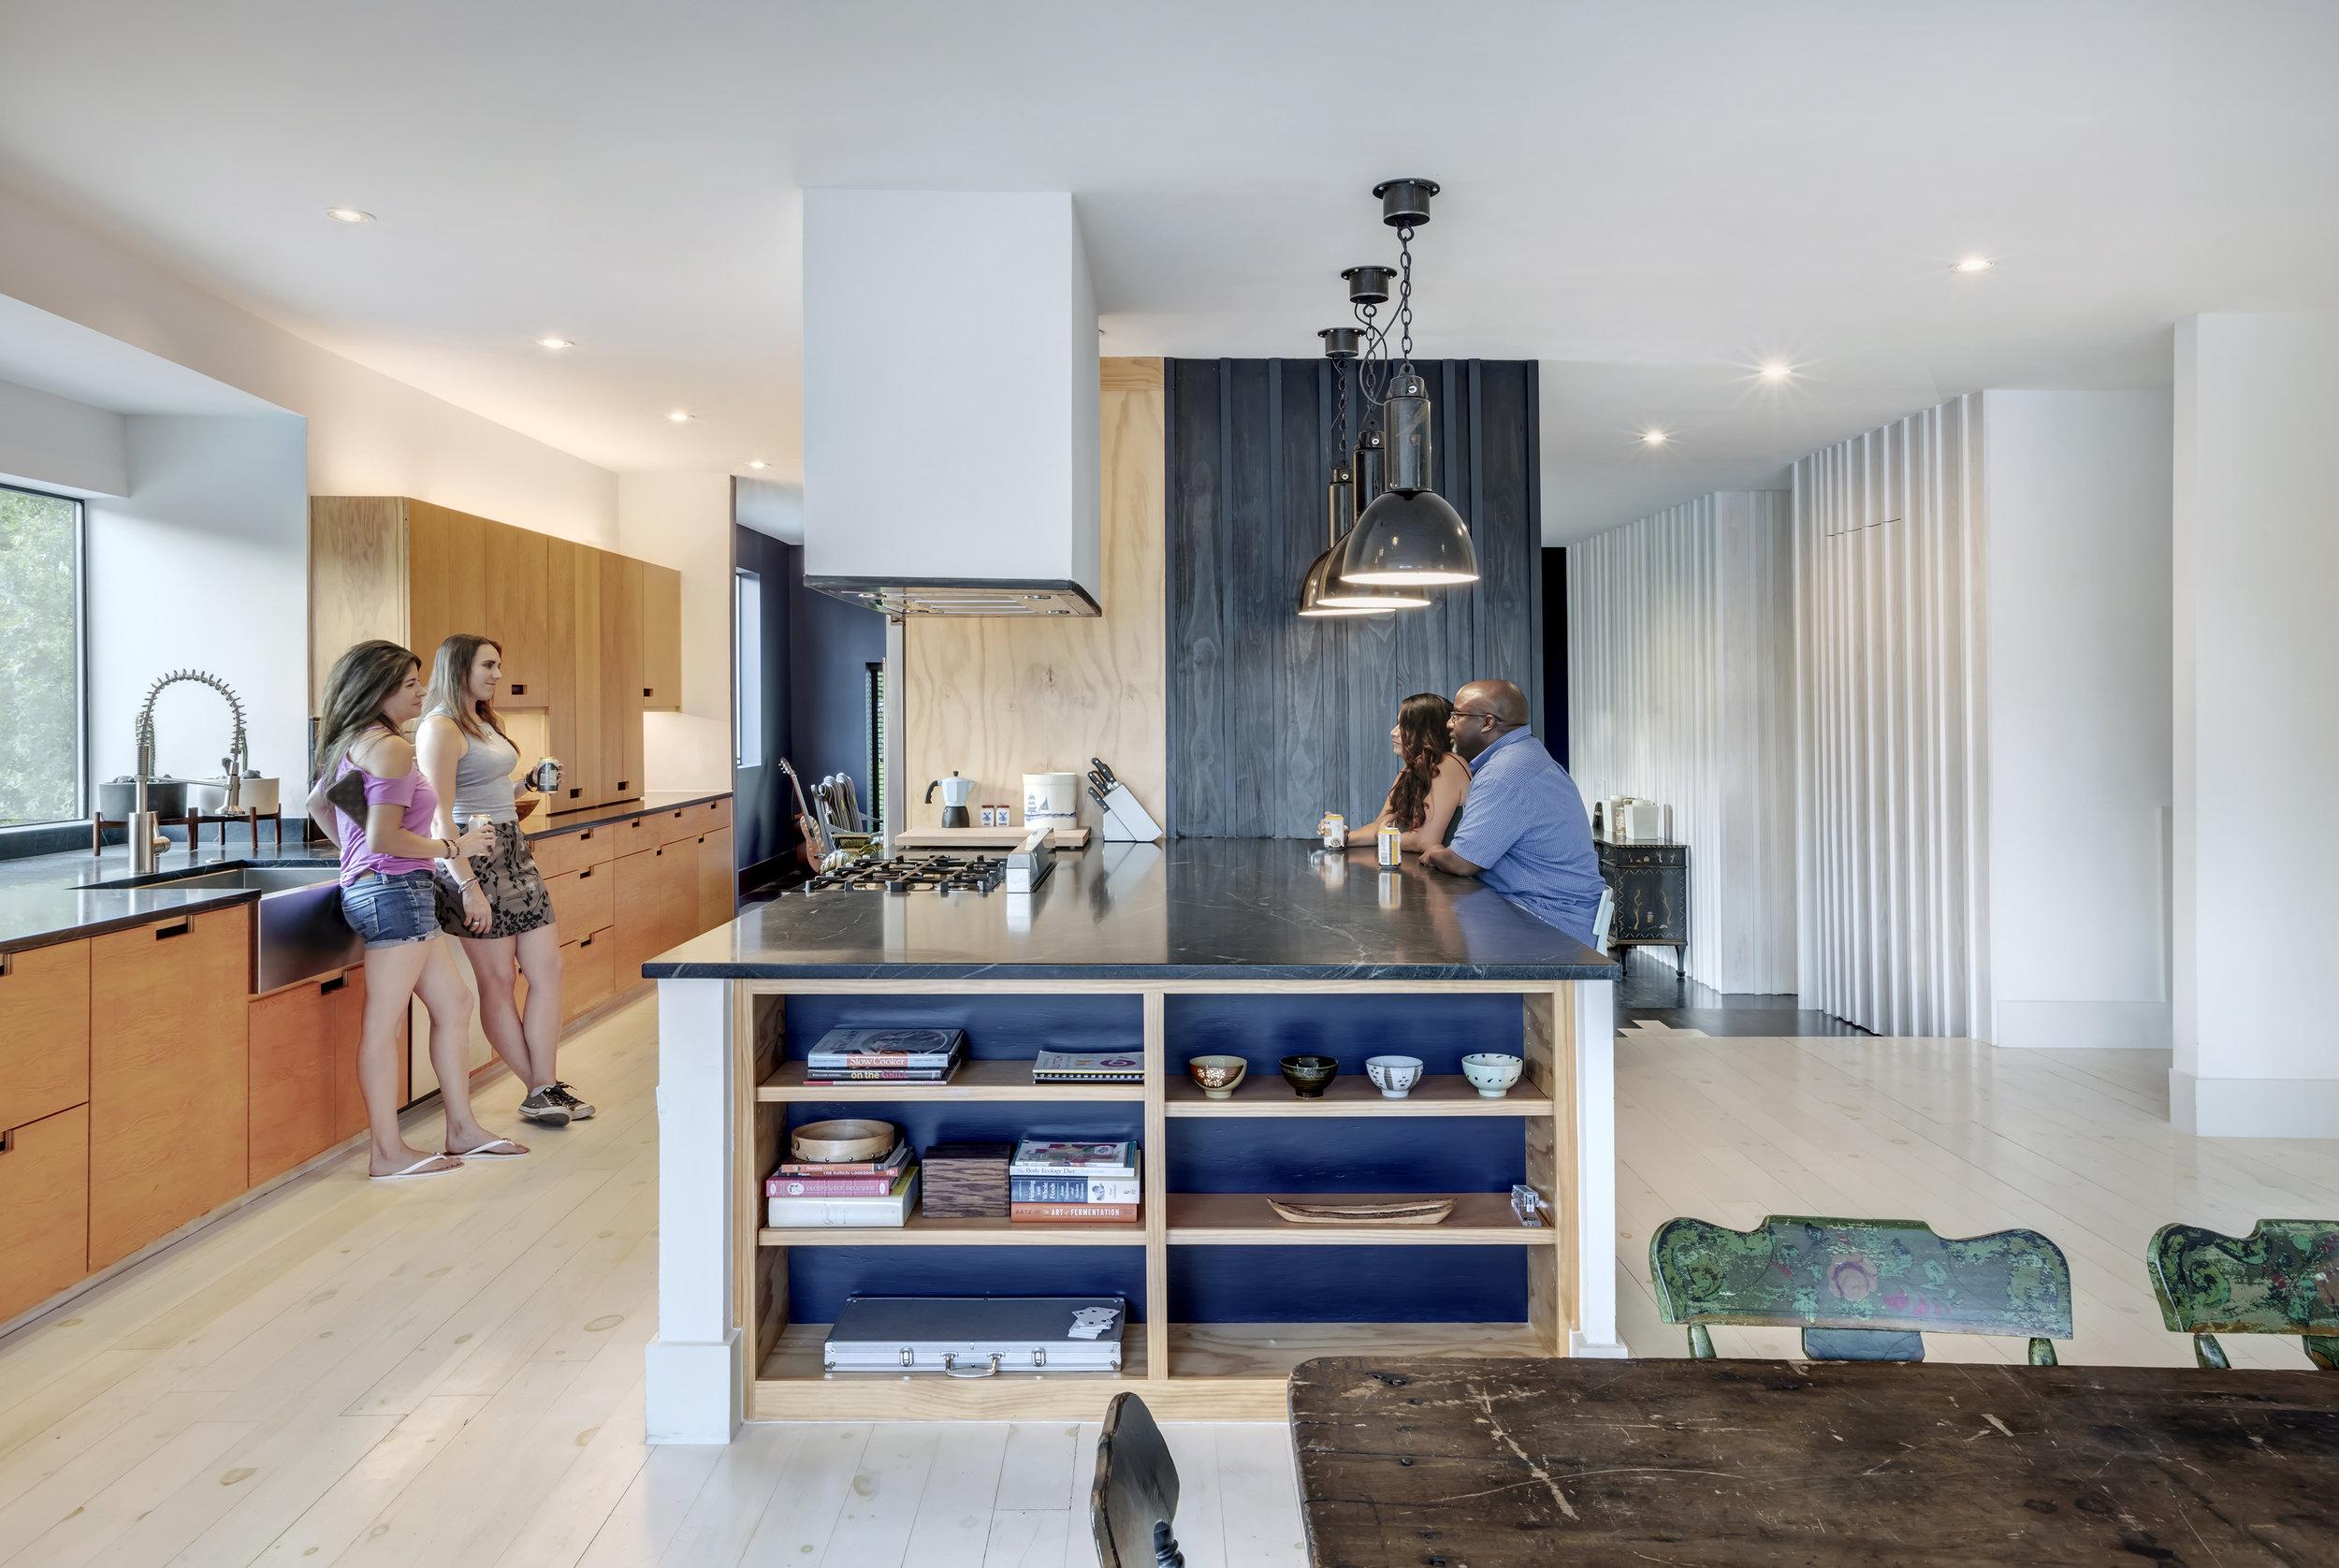 10 Mullet House by Matt Fajkus Architecture. Photo by Charles Davis Smith.jpg